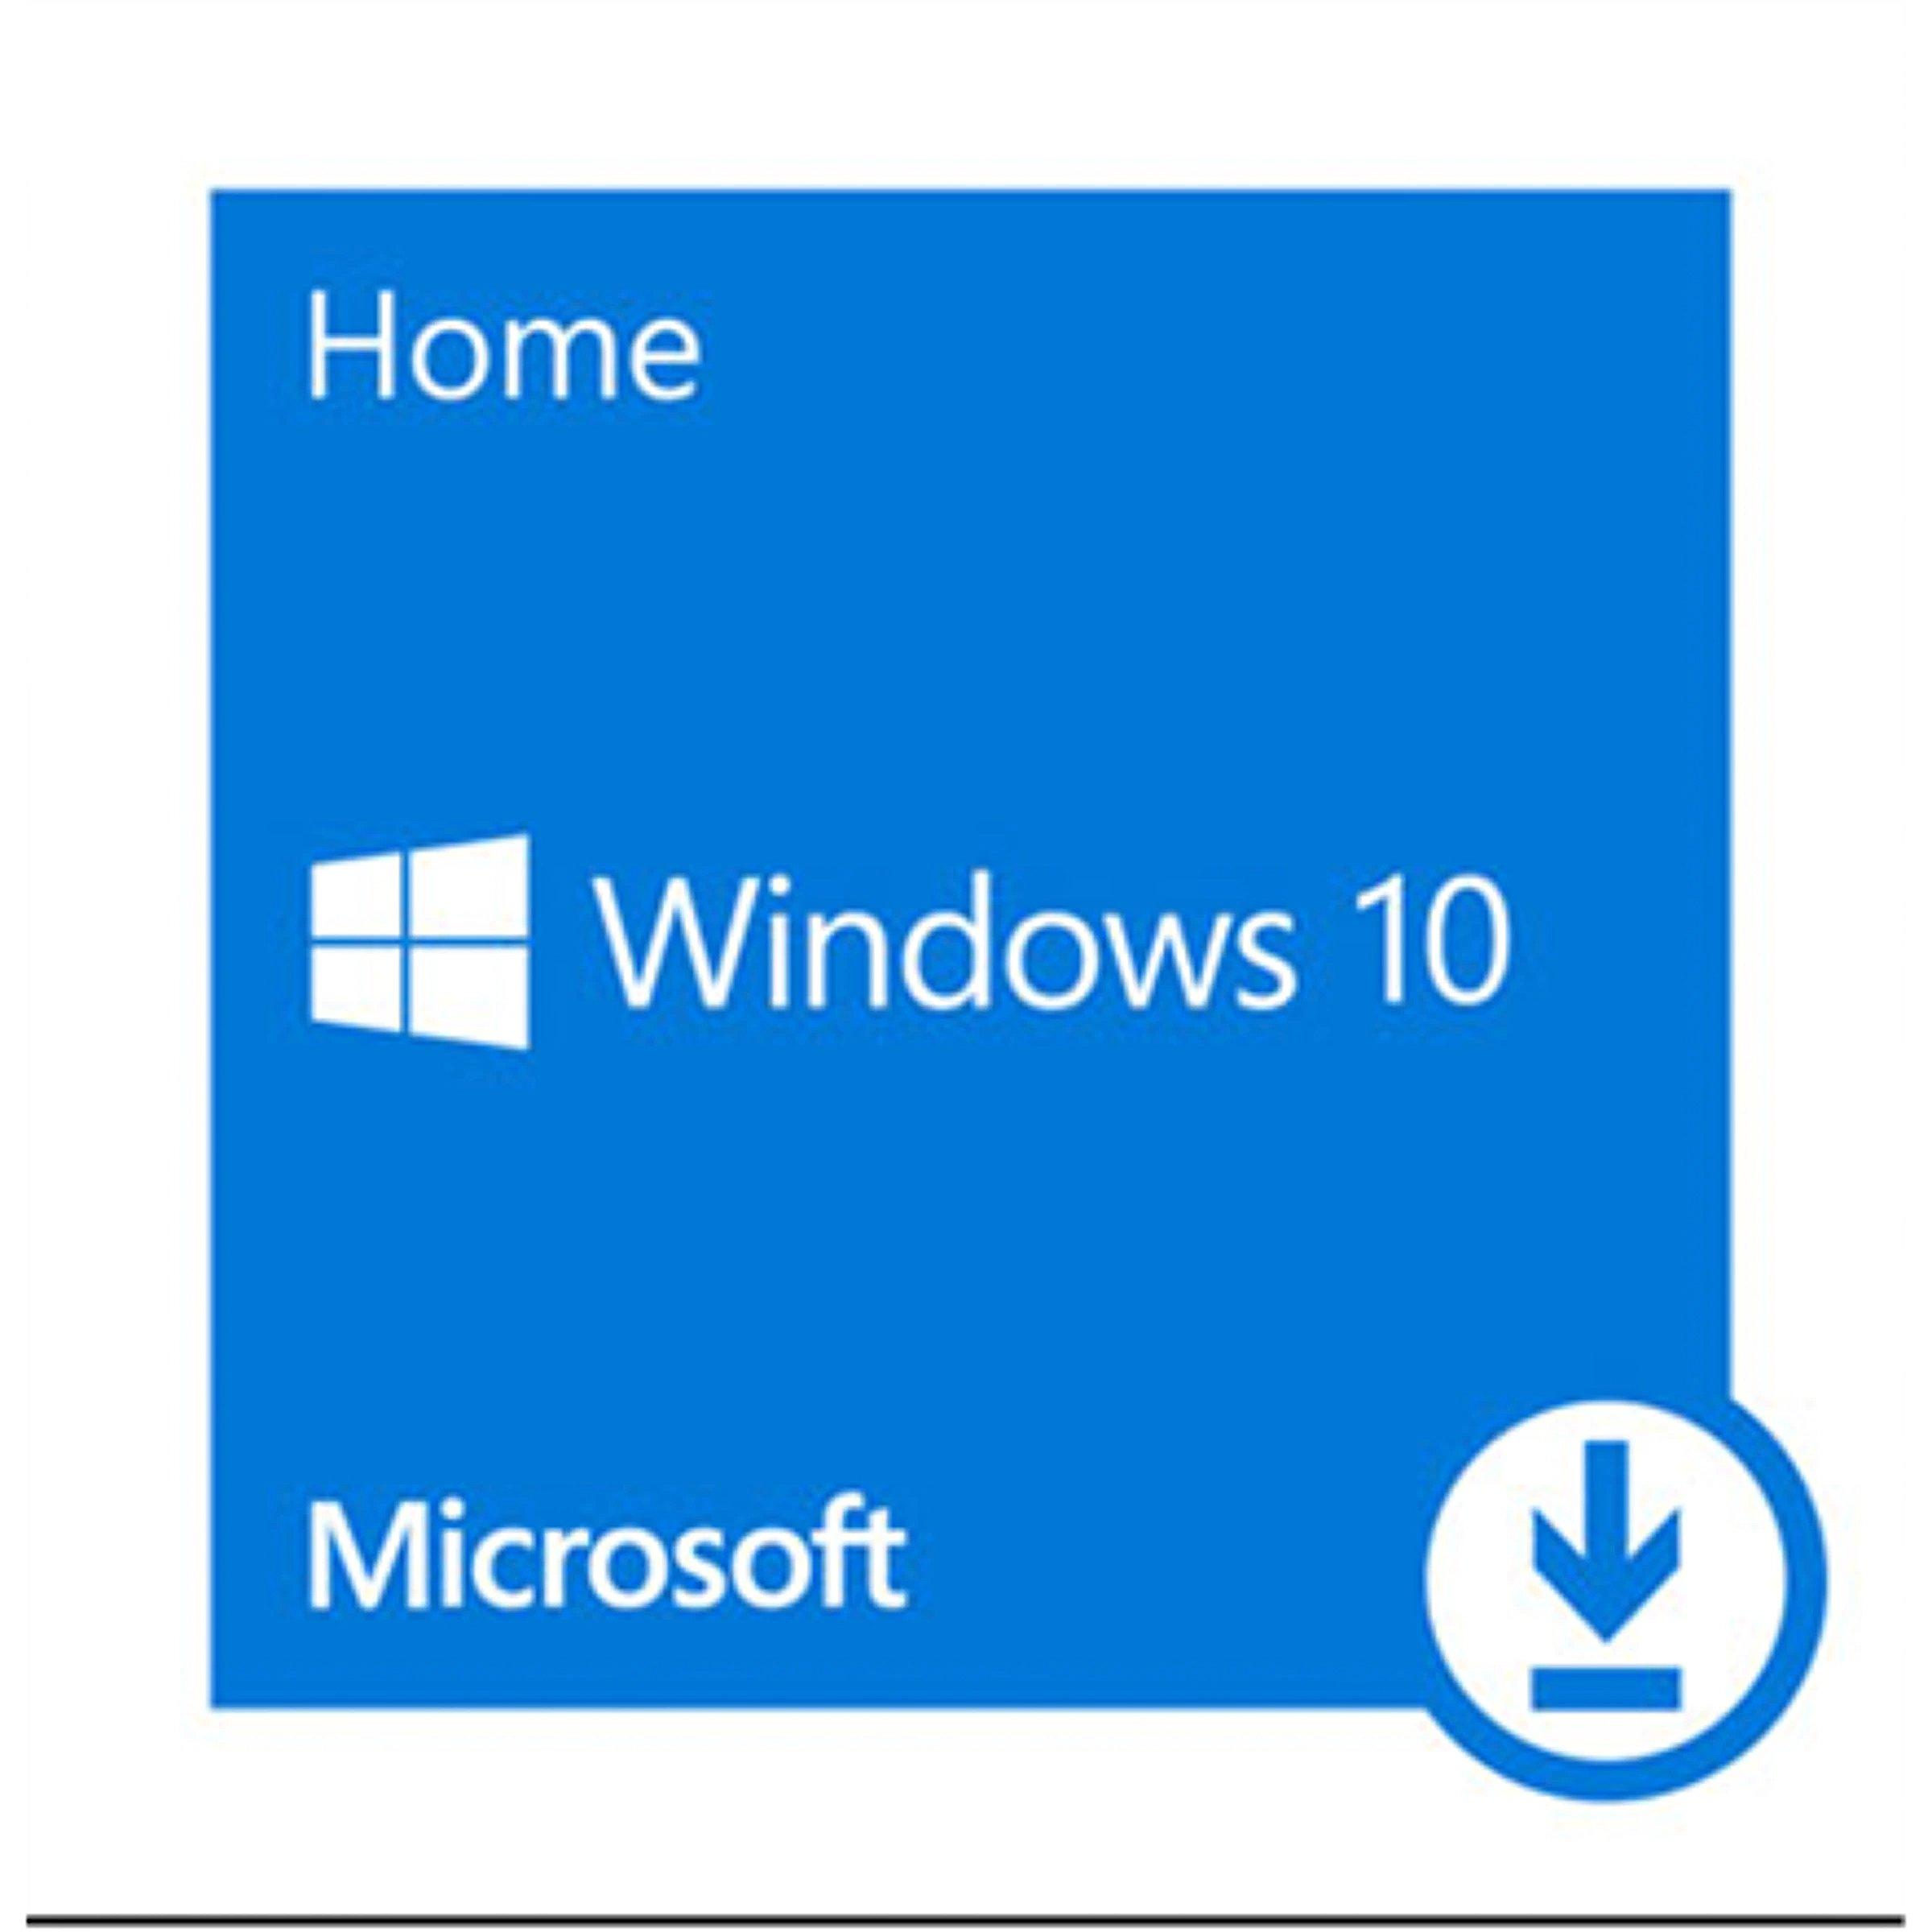 Microsoft W9-00265 Windows 10 Home, ESD, ALL Langu..